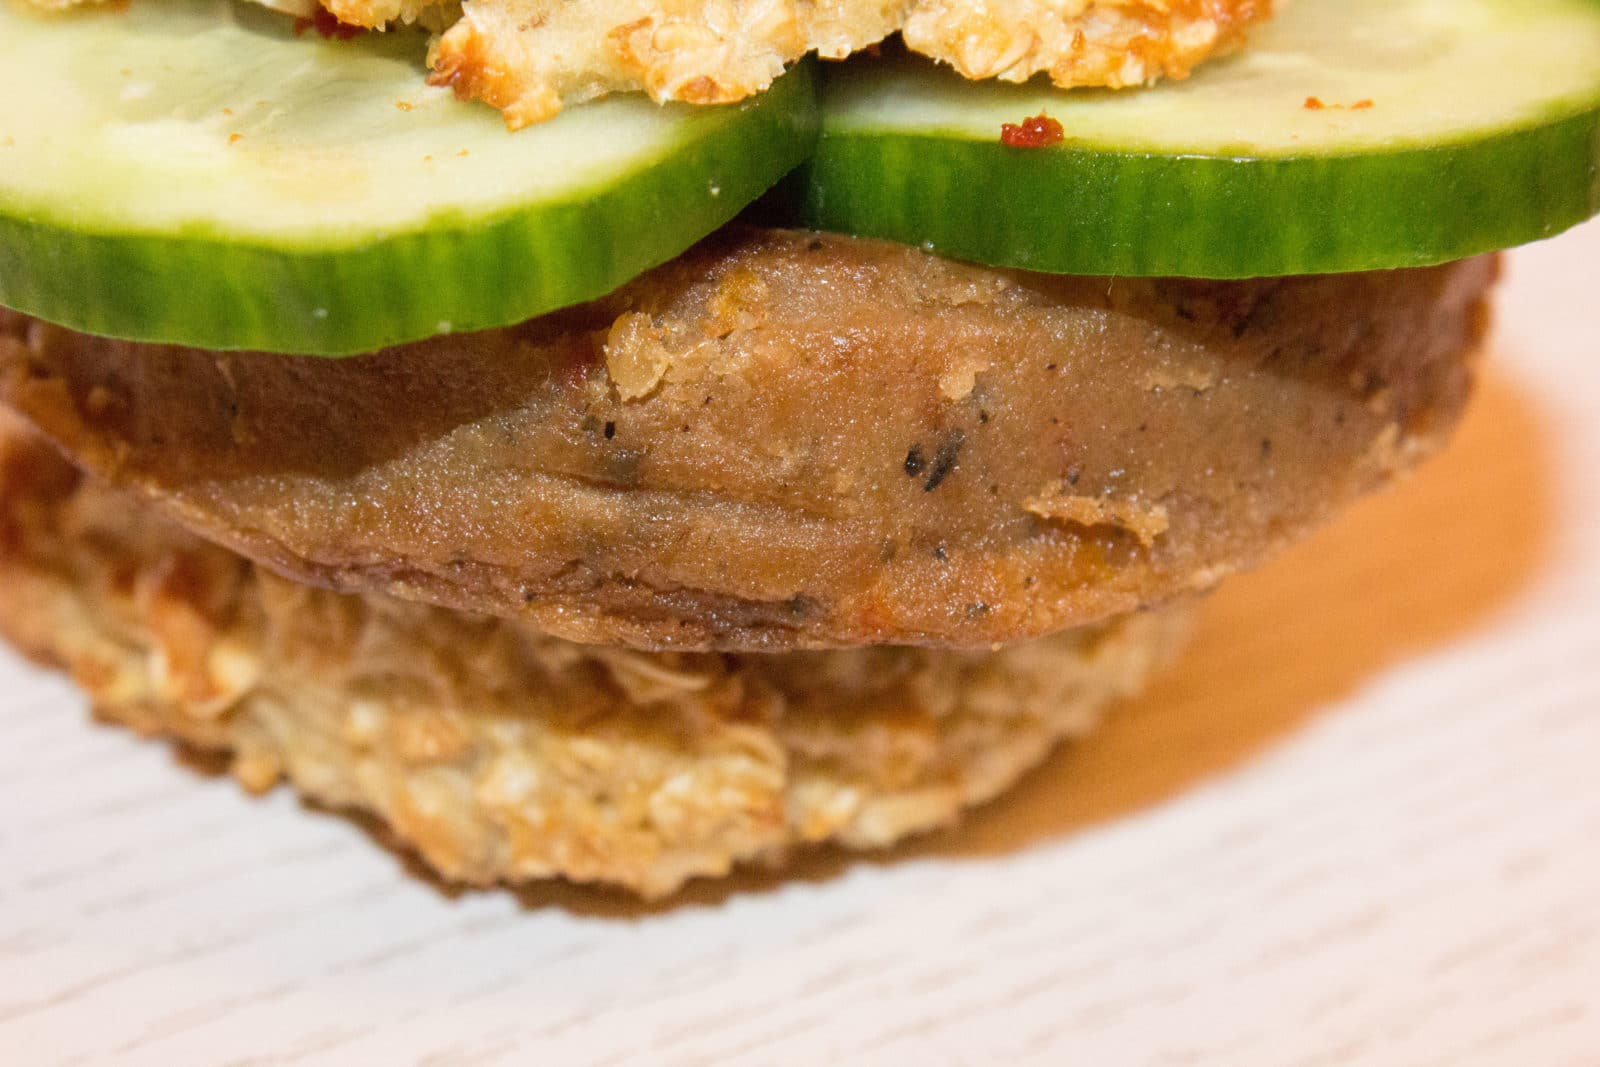 rezept gesunde und vegetarische burger handmade kultur. Black Bedroom Furniture Sets. Home Design Ideas